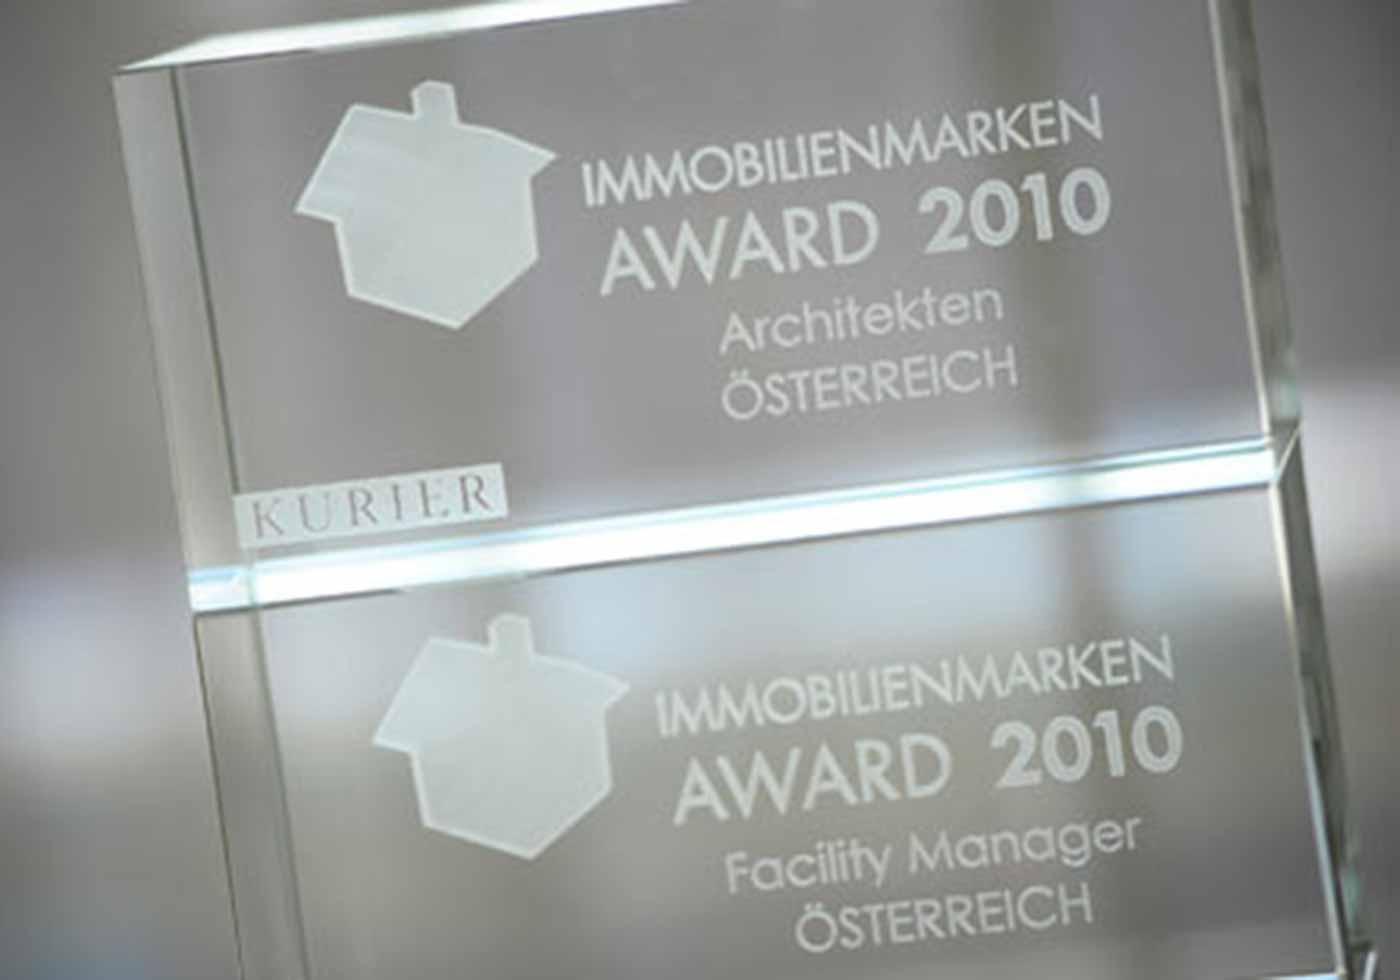 The Real Estate Brand Award 2010, Austria